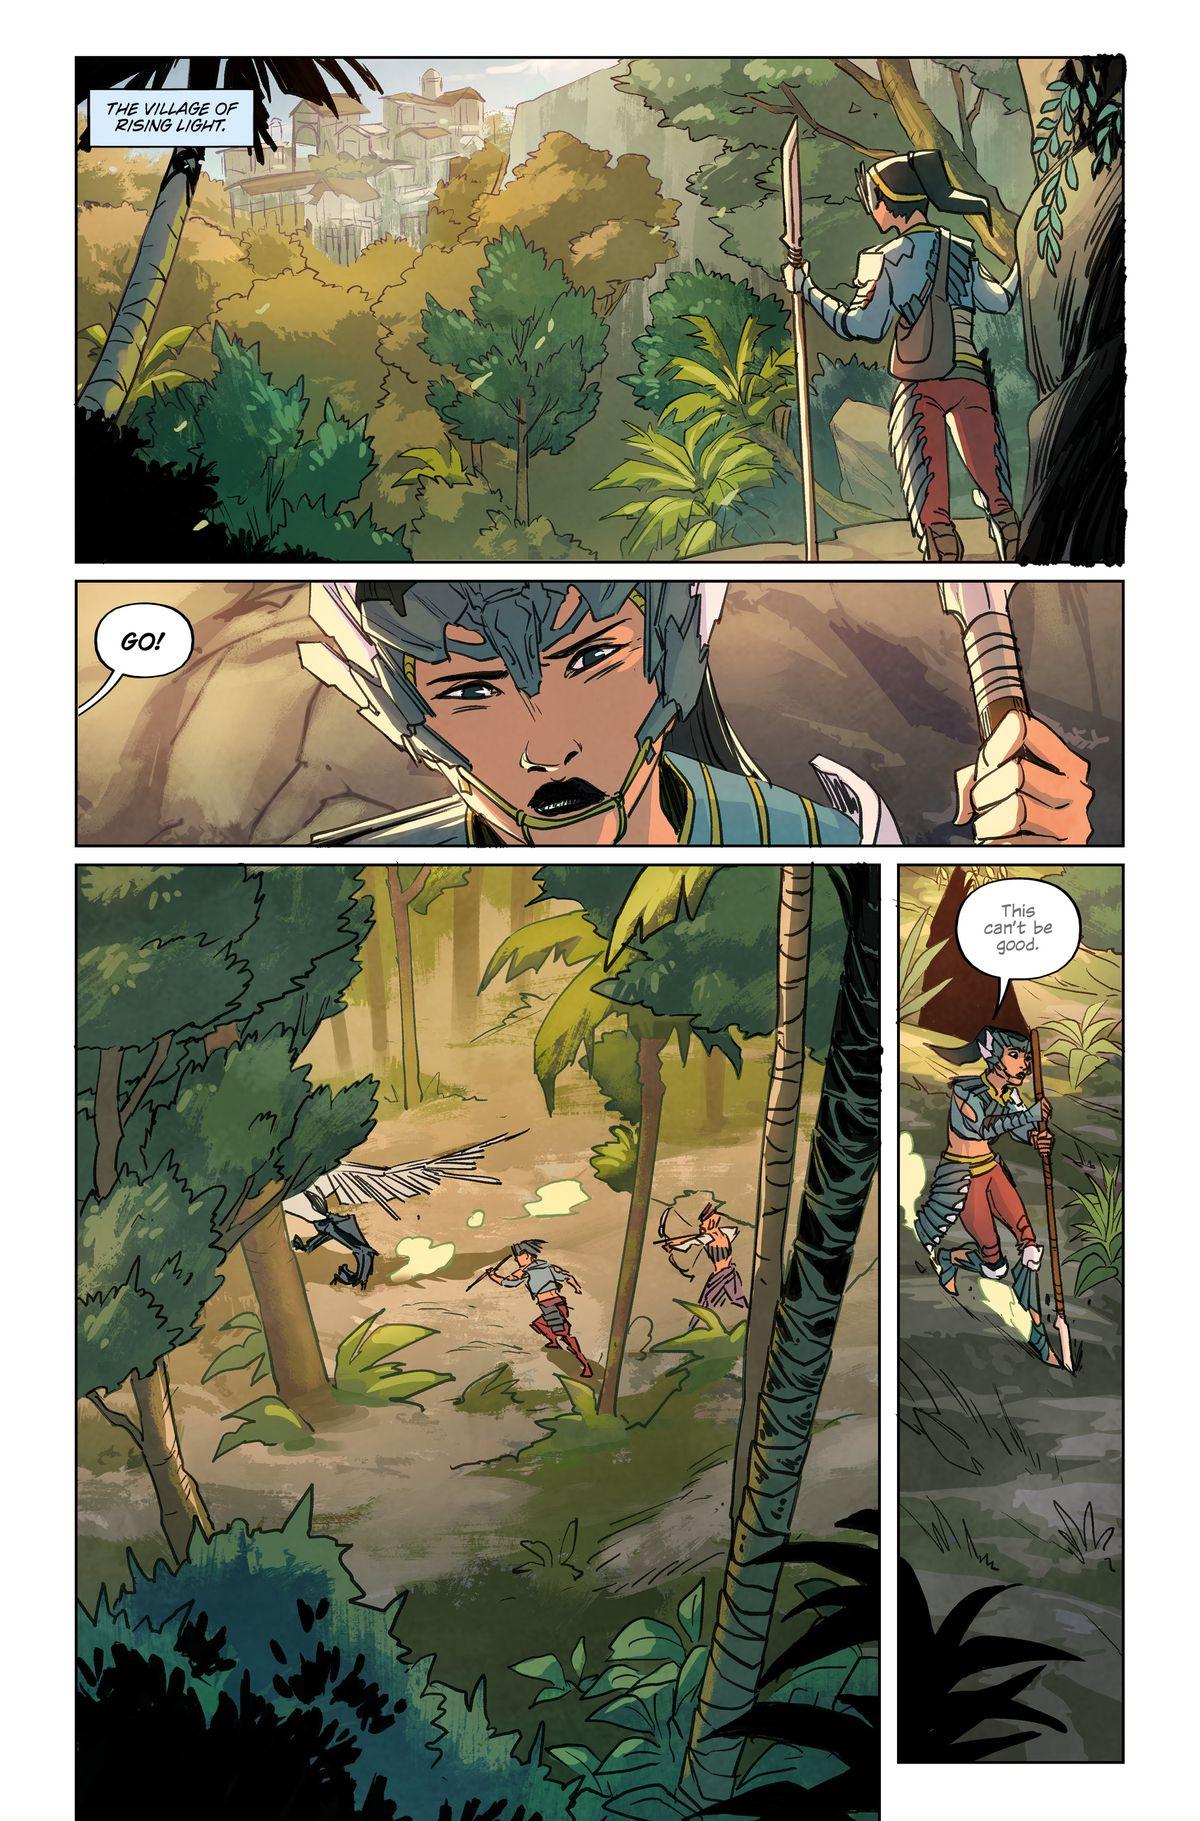 A page from Horizon Zero Dawn #1, Titan Comics (2020) featuring Talanah Khane Padish, Sunhawk of the Hungers Lodge